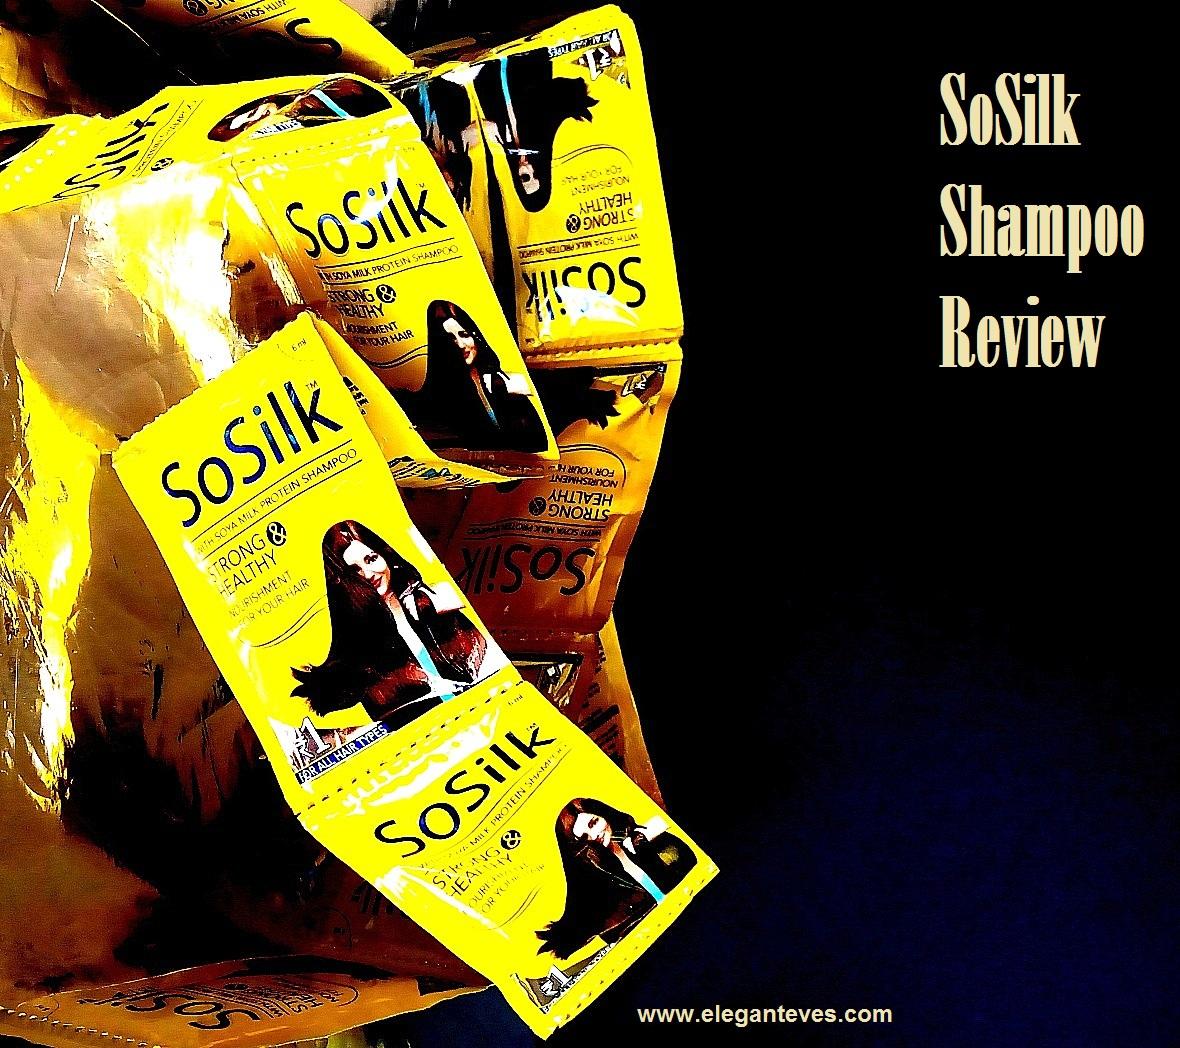 7b3288dcf Review of Sosilk Shampoo by Prem Henna Pvt. Ltd - Elegant Eves